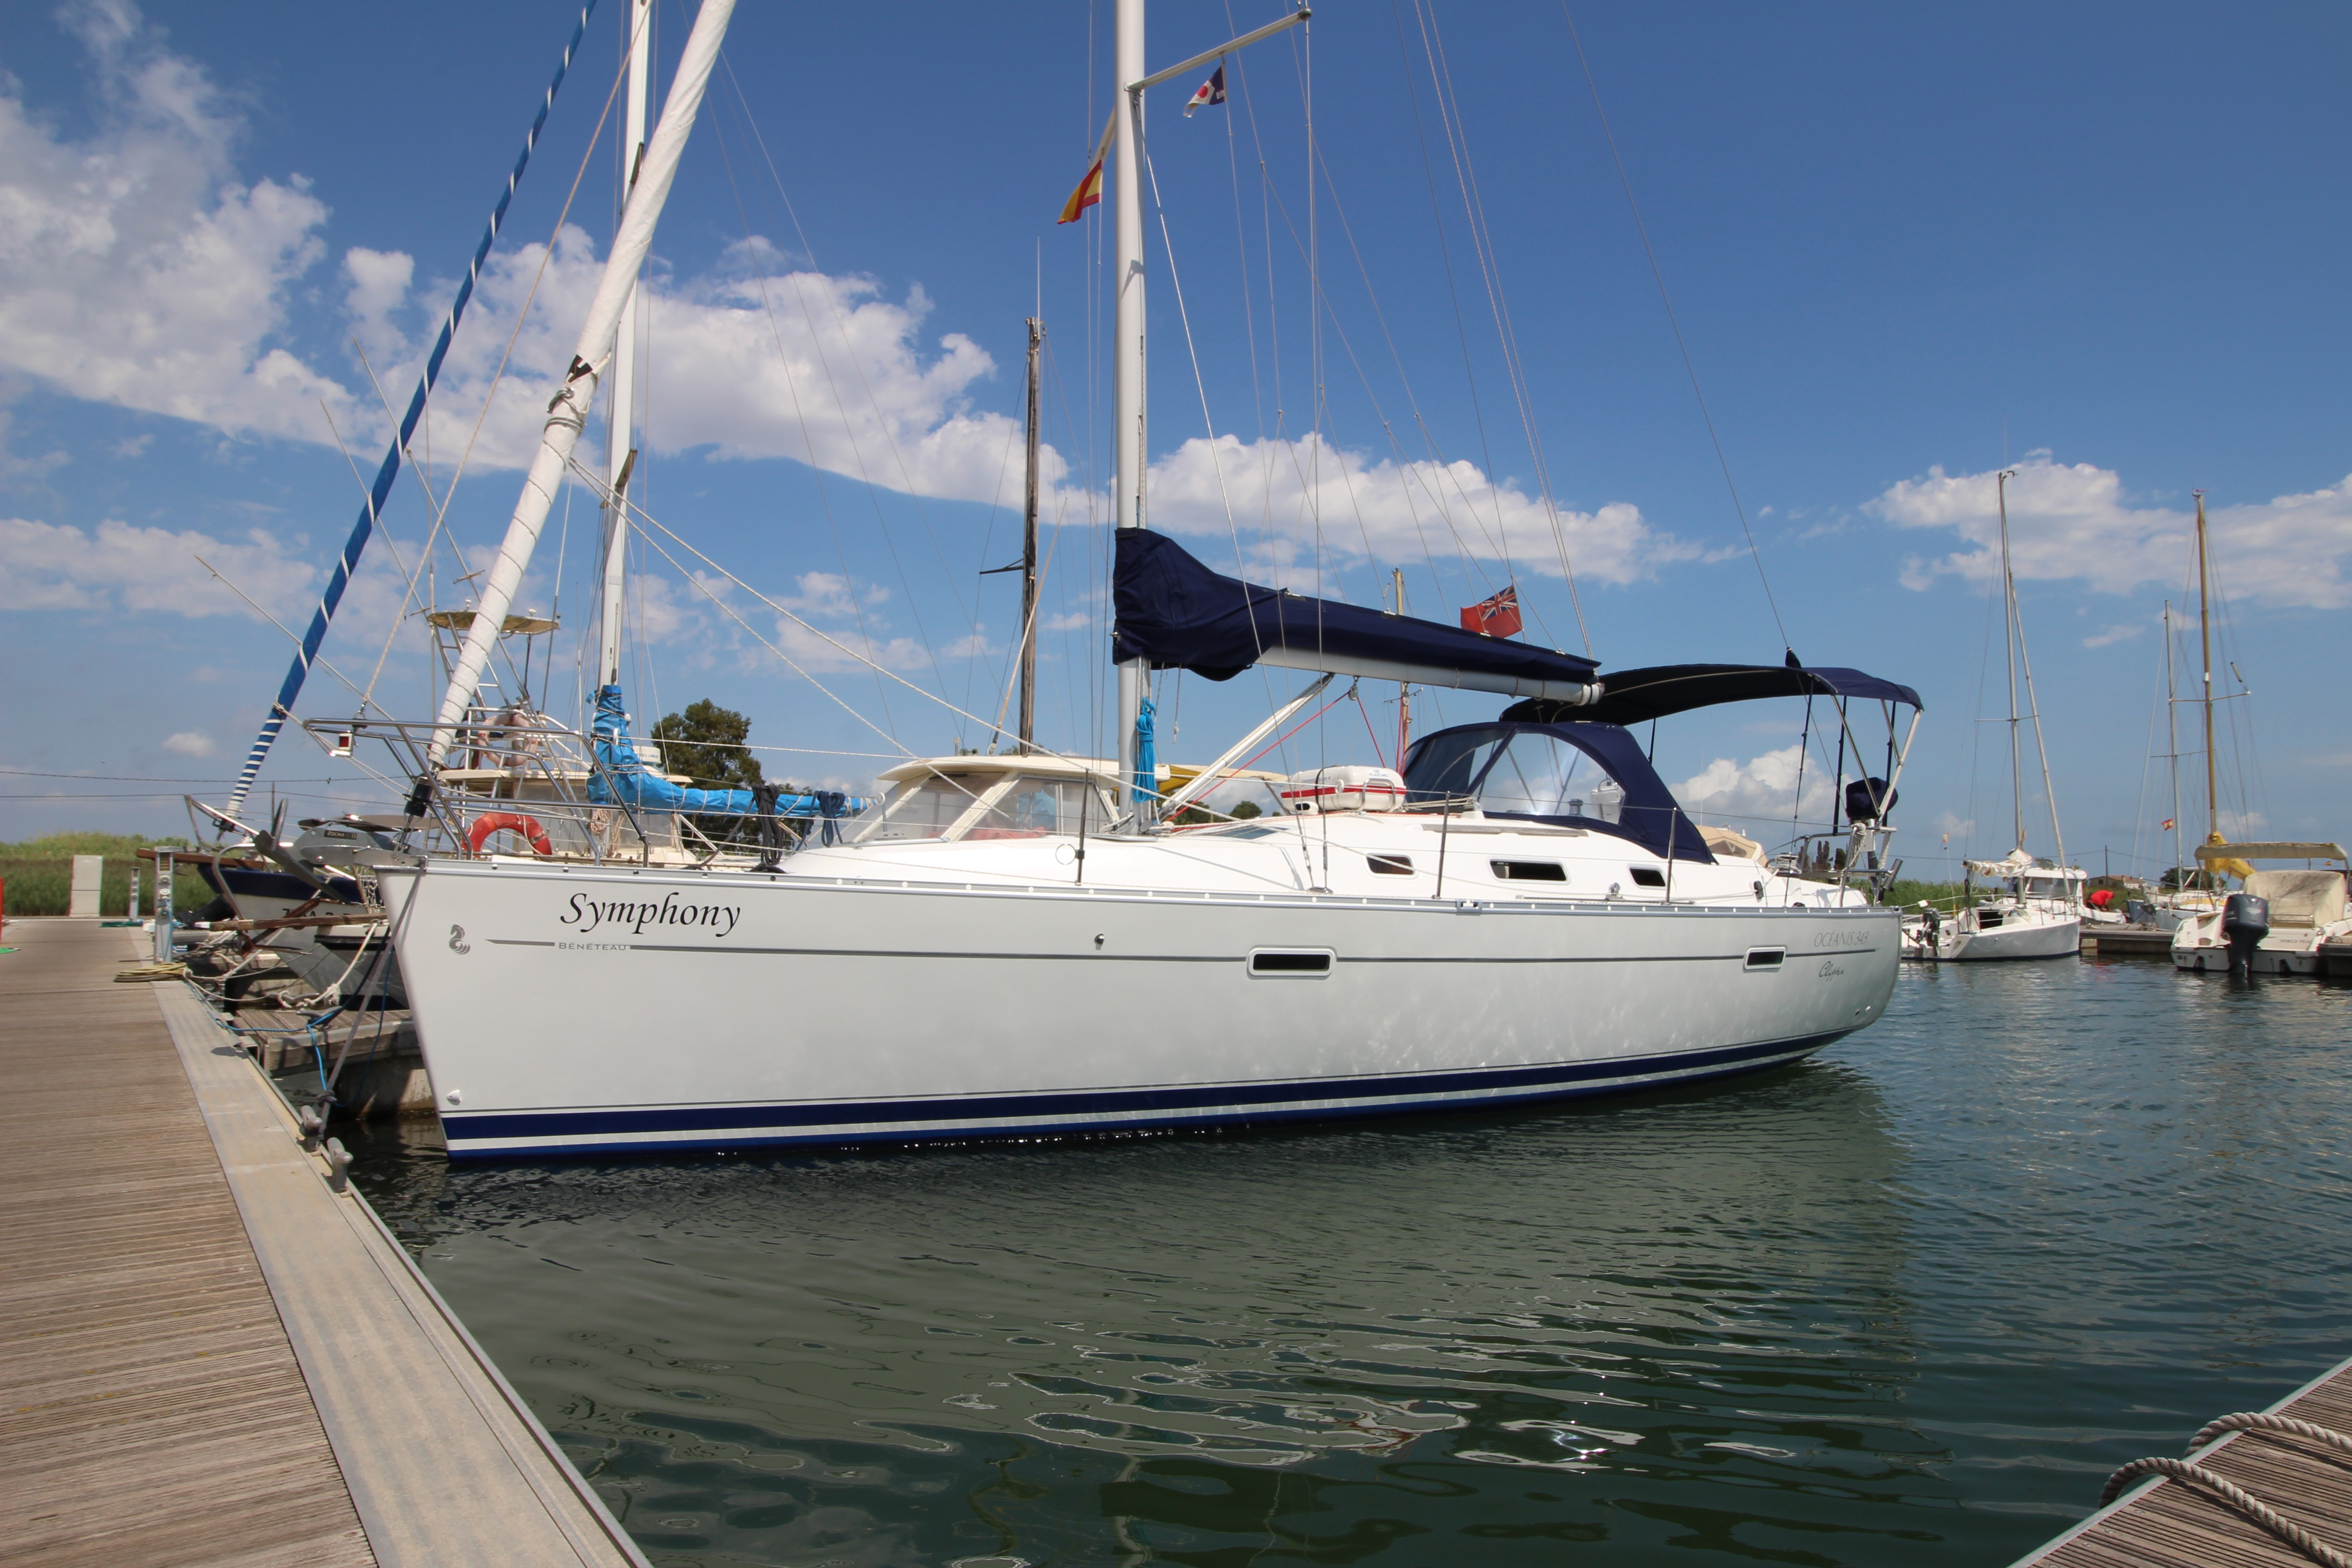 Beneteau Oceanis Clipper 343 For sale Beneteau Oceanis 343 Clipper